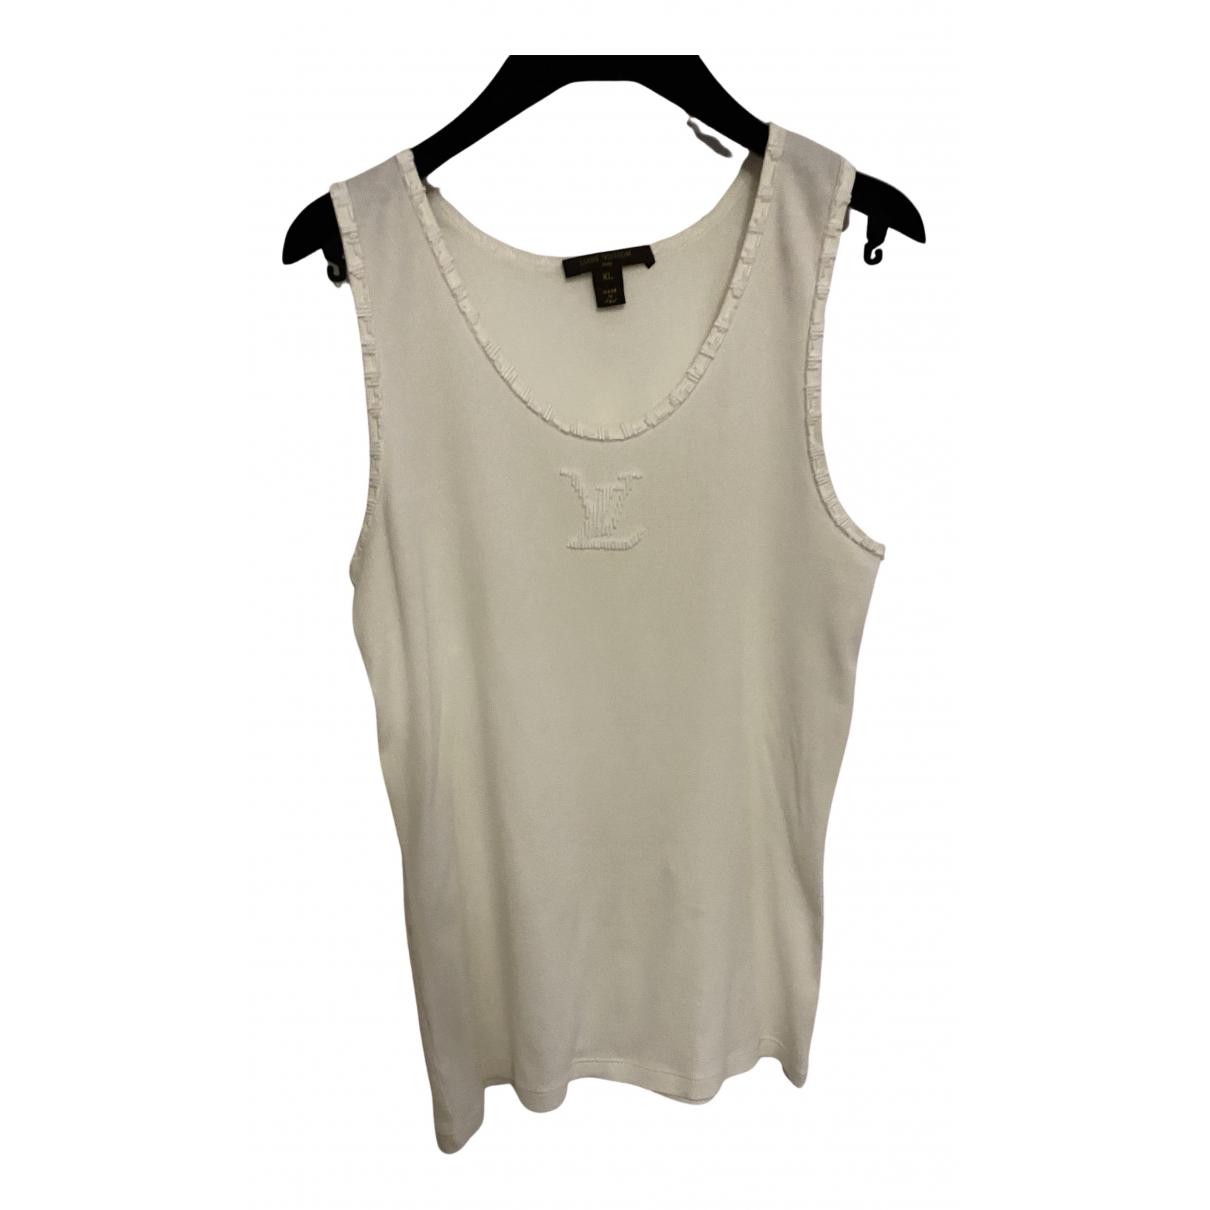 Louis Vuitton N White Cotton  top for Women XL International